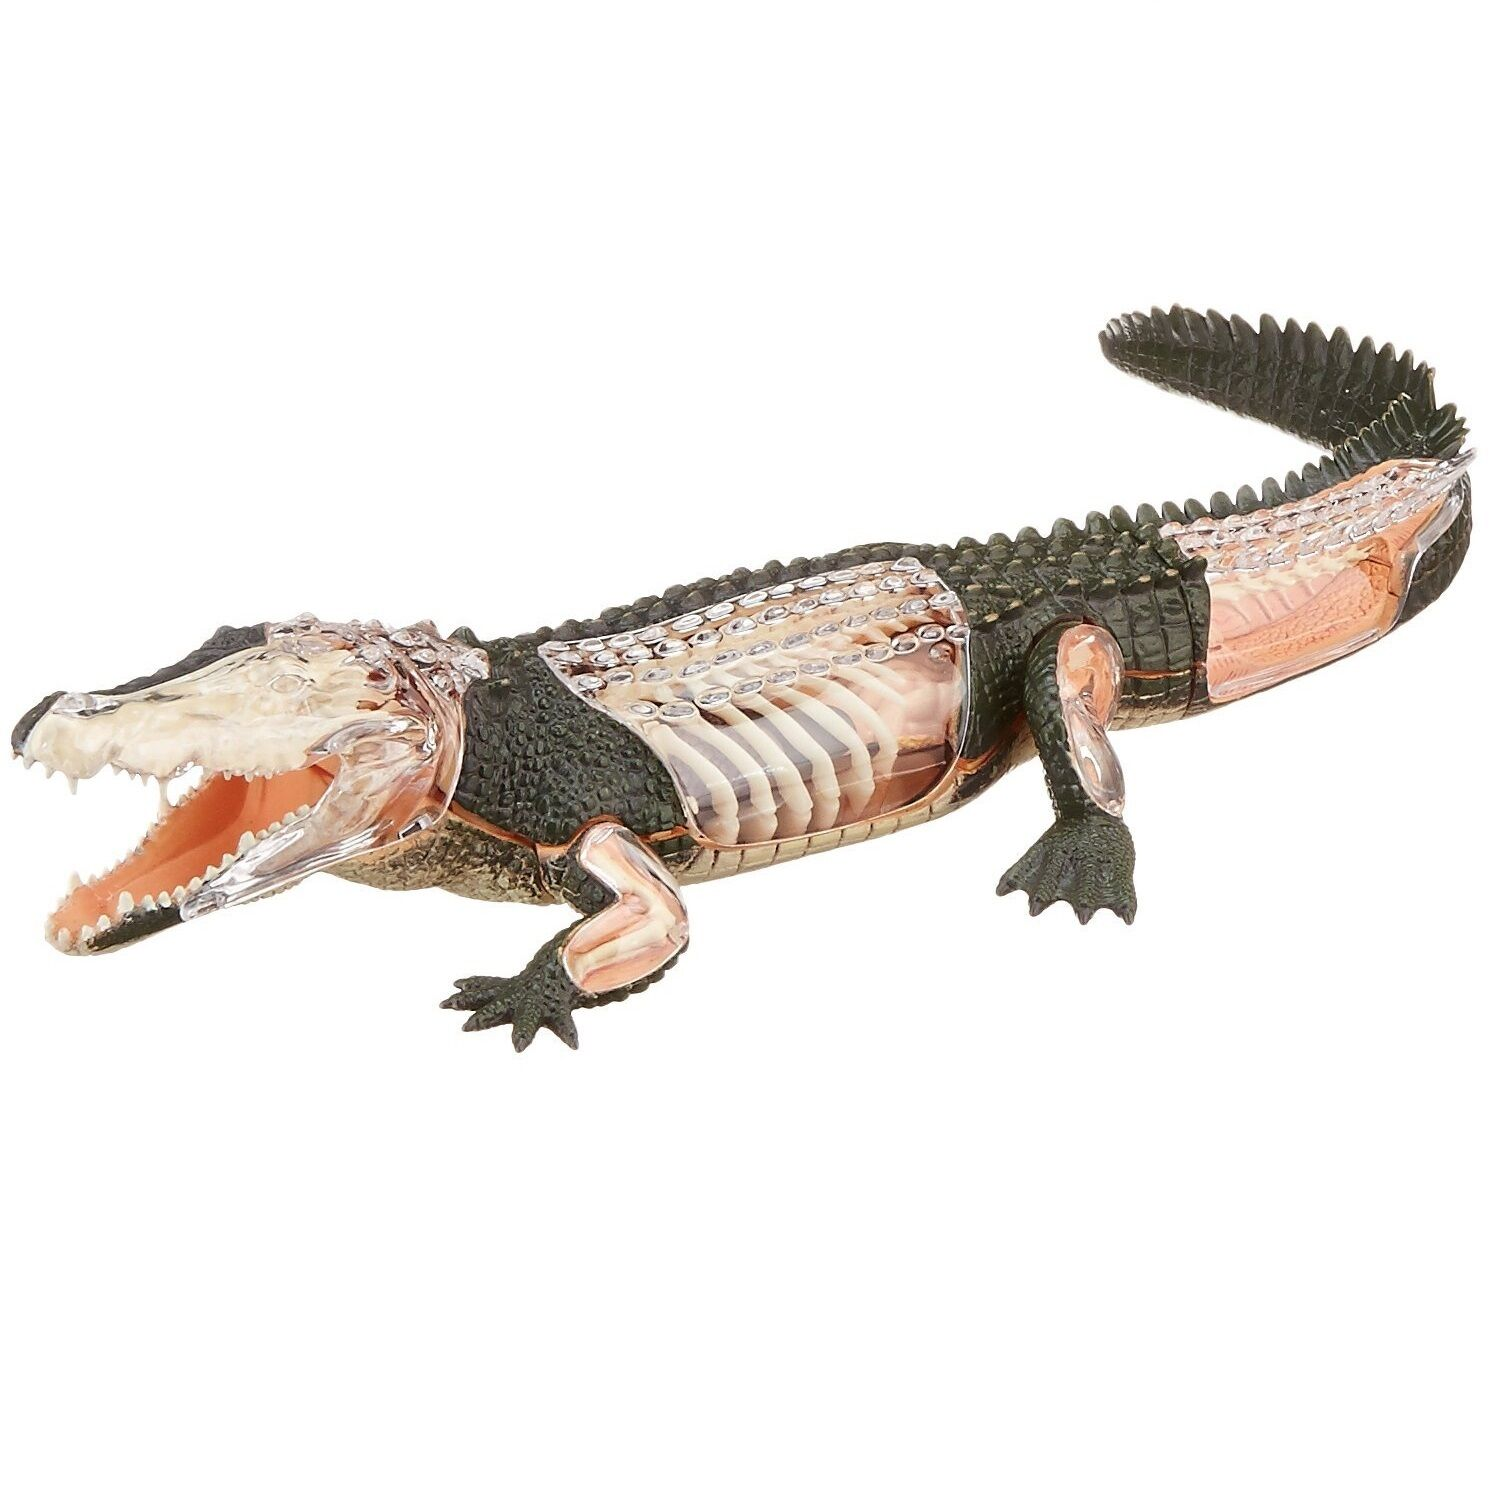 TEDCO Toys 26114 4d Vision Crocodile Anatomy Vyo1109 | eBay